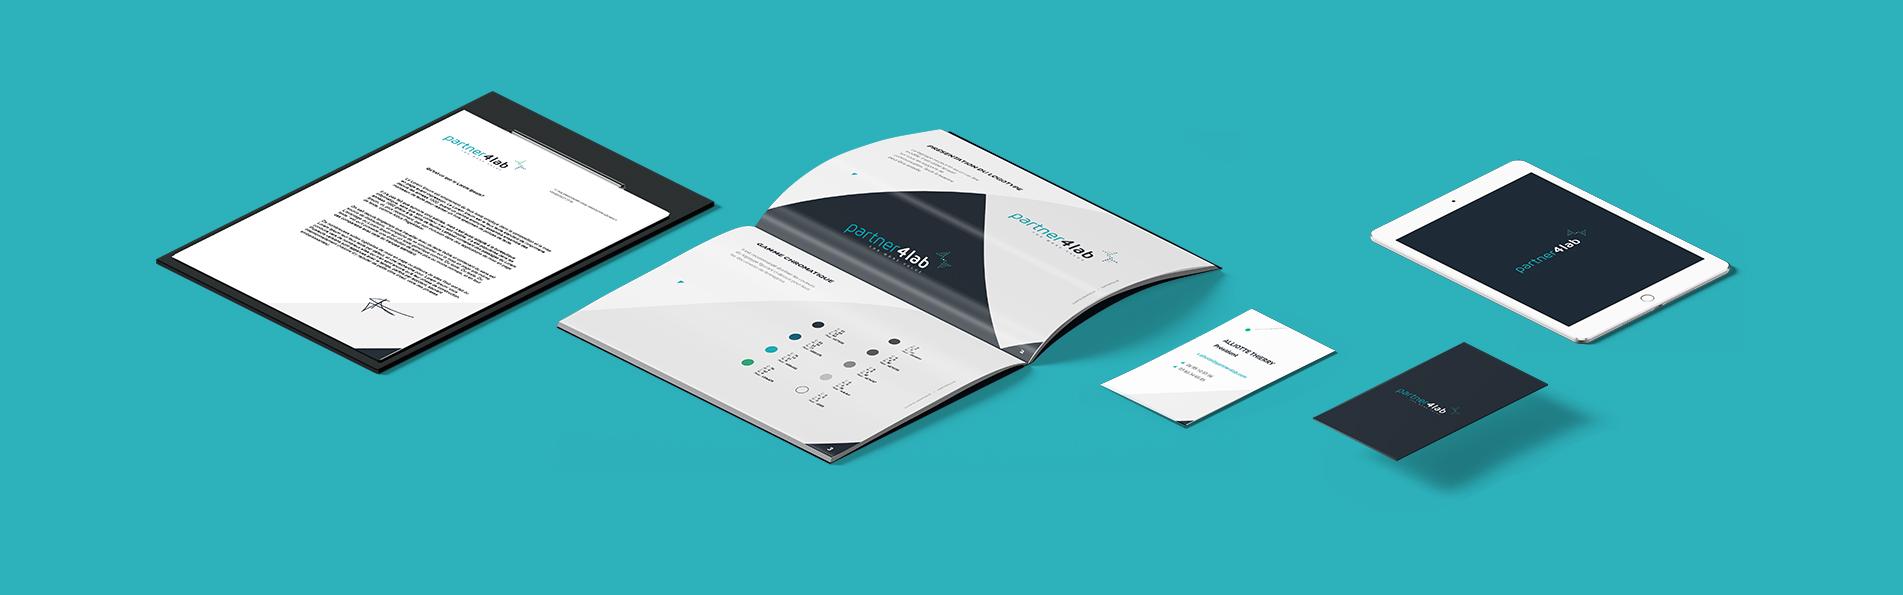 branding-partner4lab-4